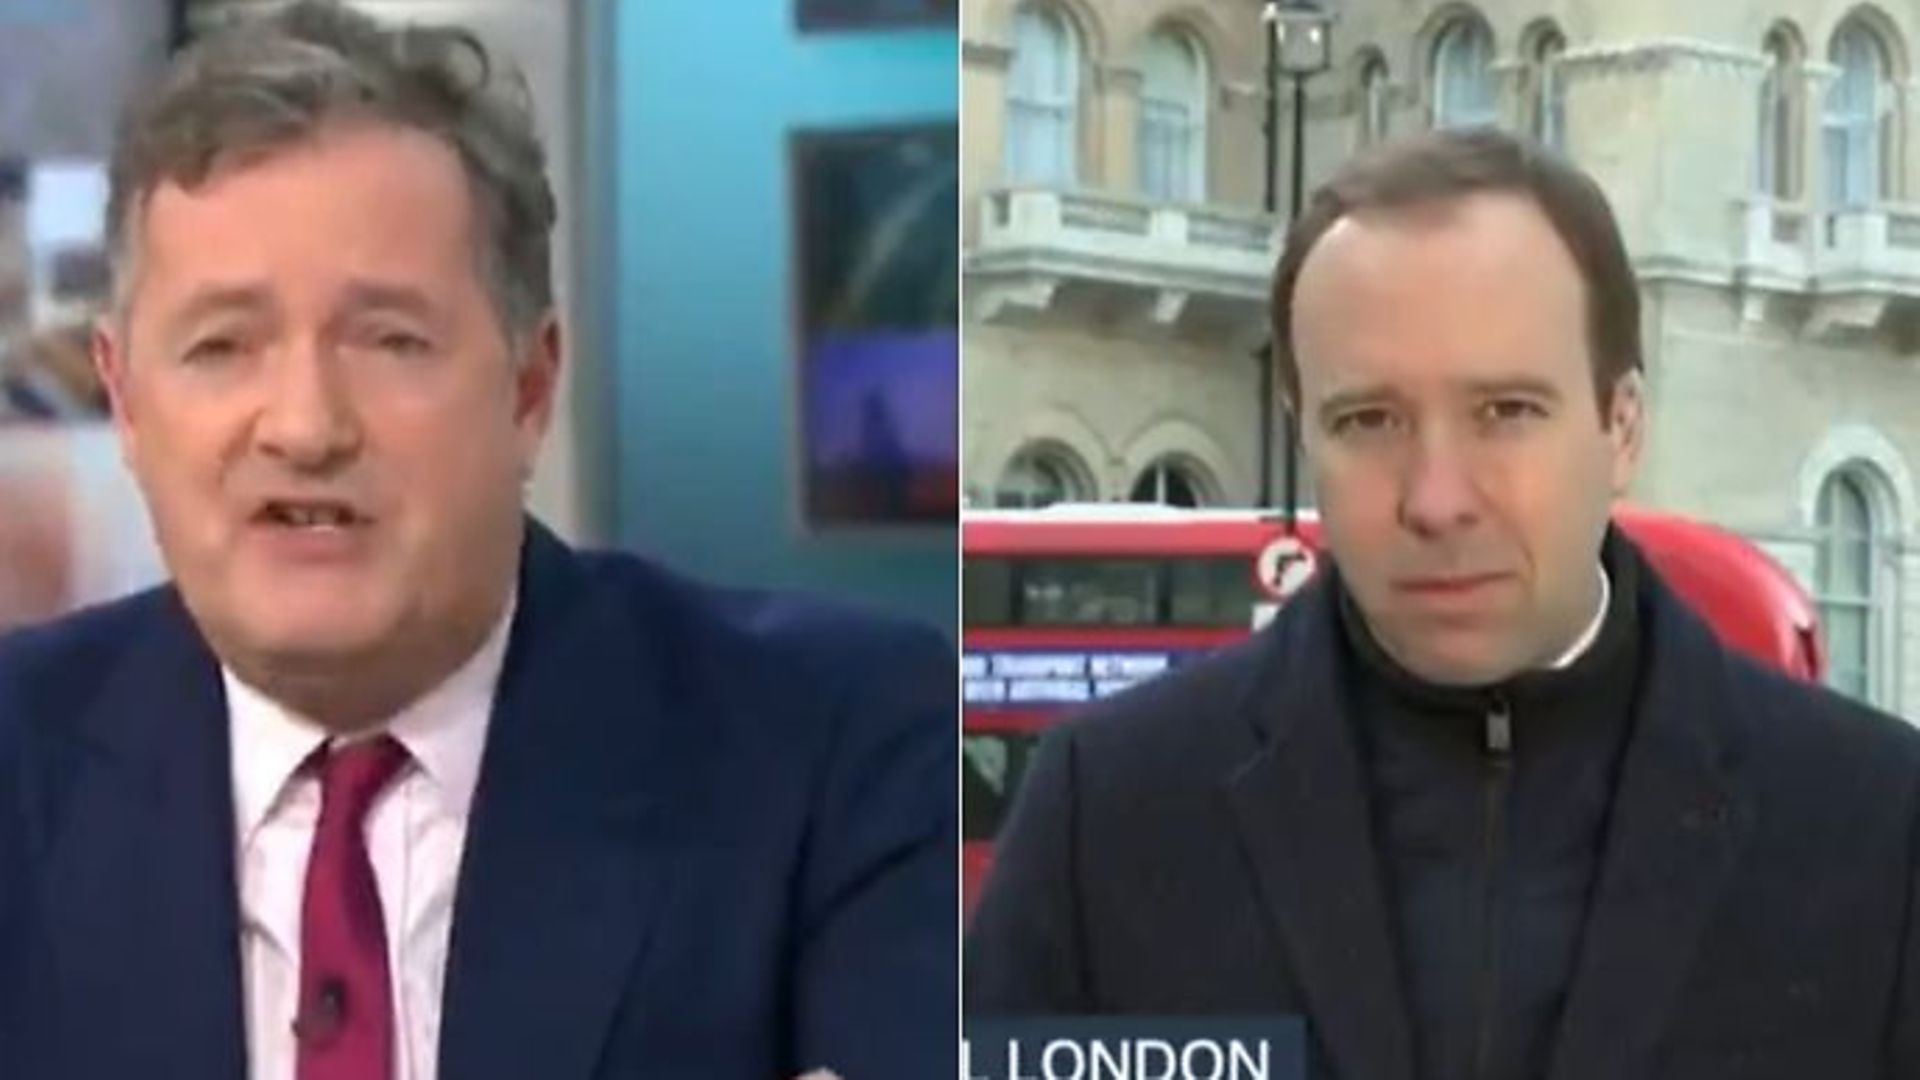 GMB presenter Piers Morgan (L) and health secretary Matt Hancock - Credit: Twitter